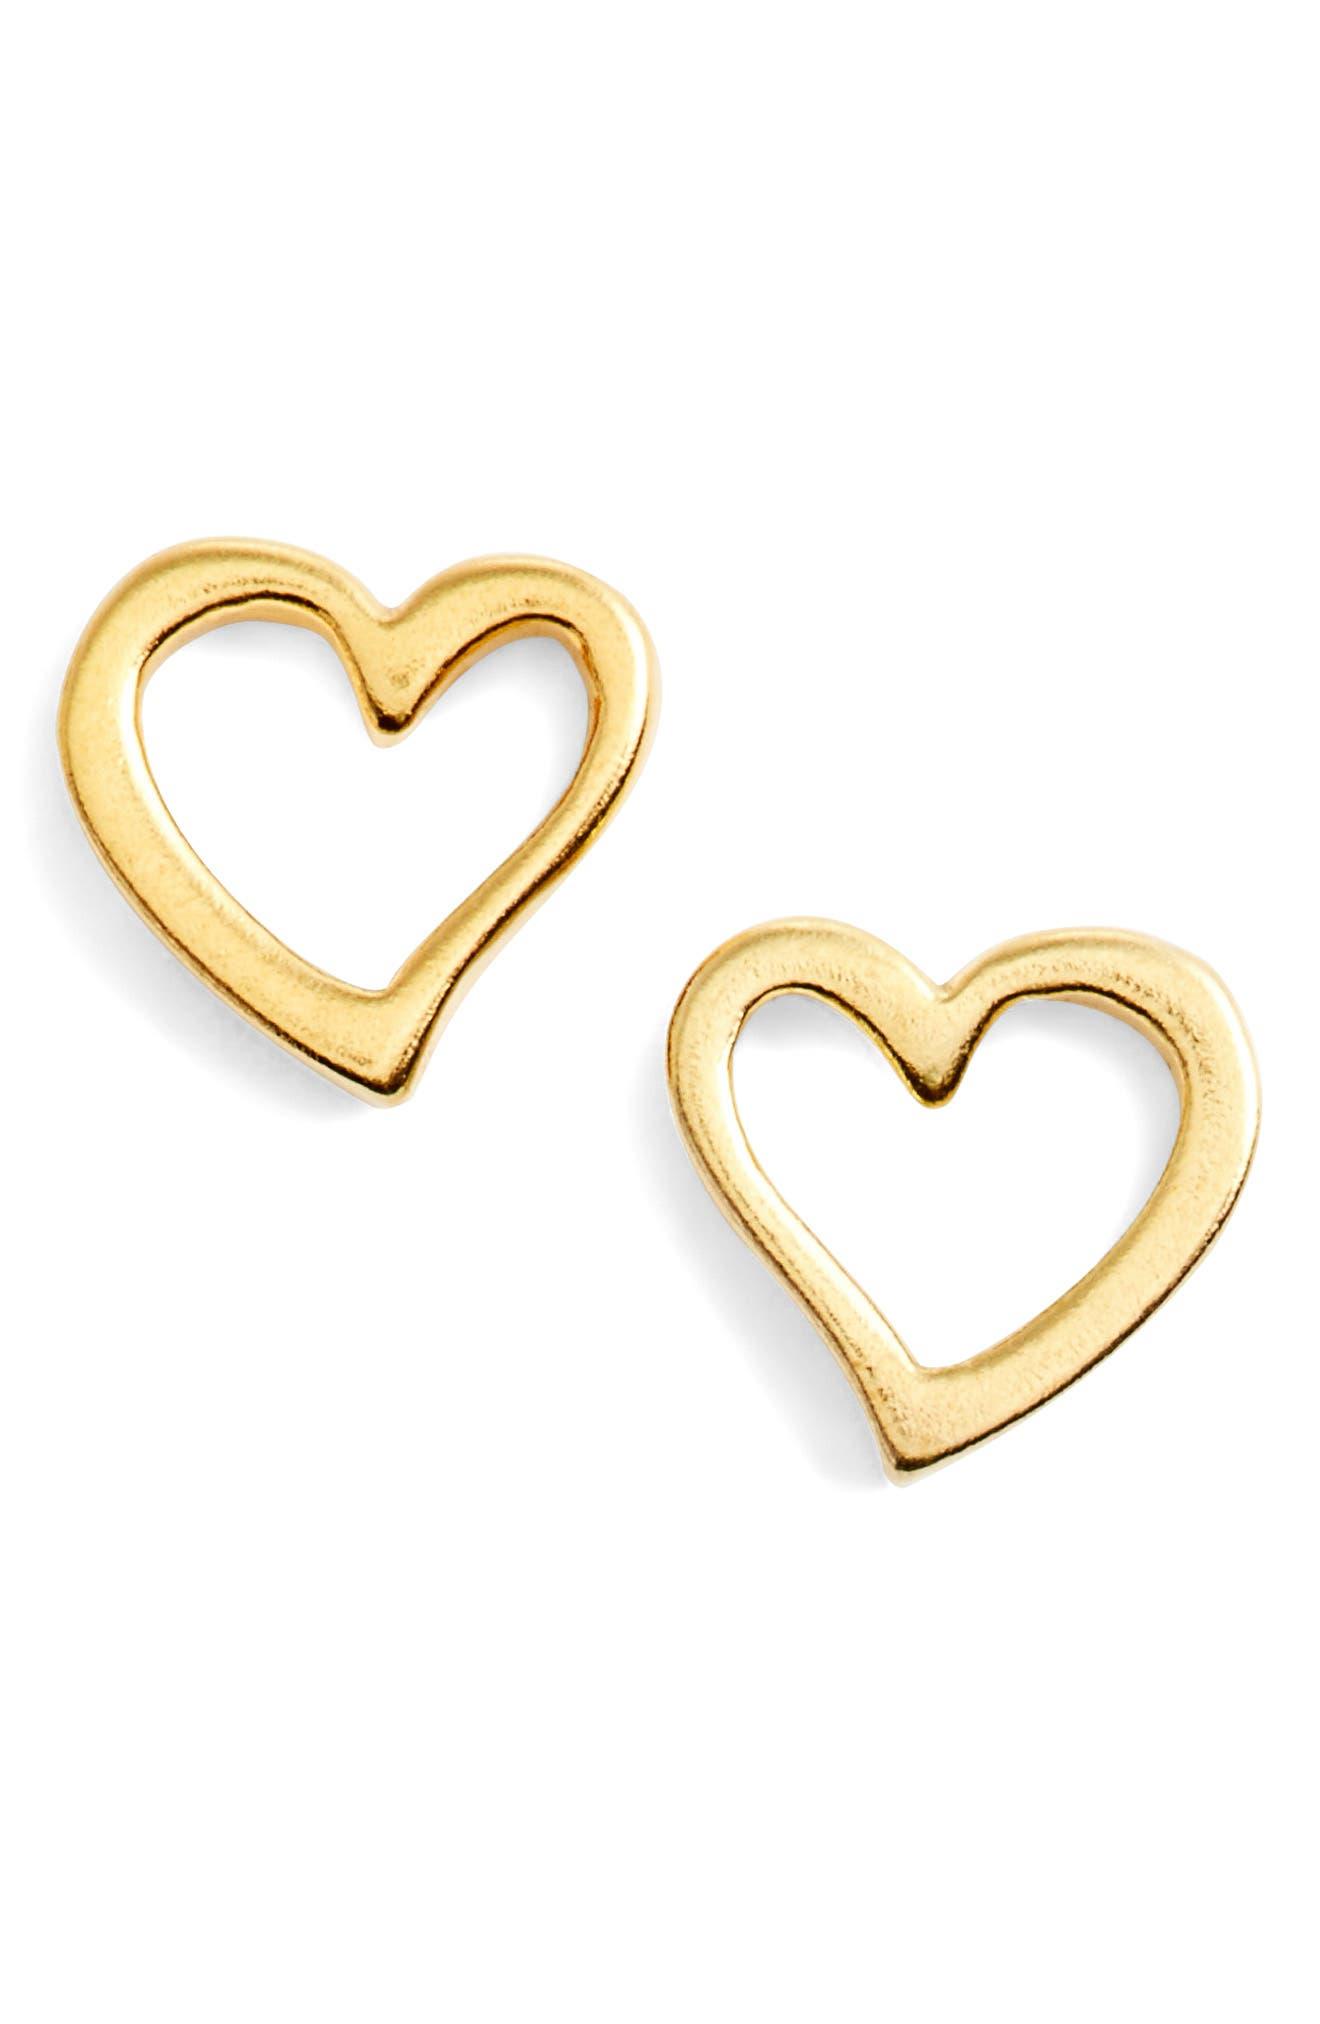 Alex and Ani Heart Earrings